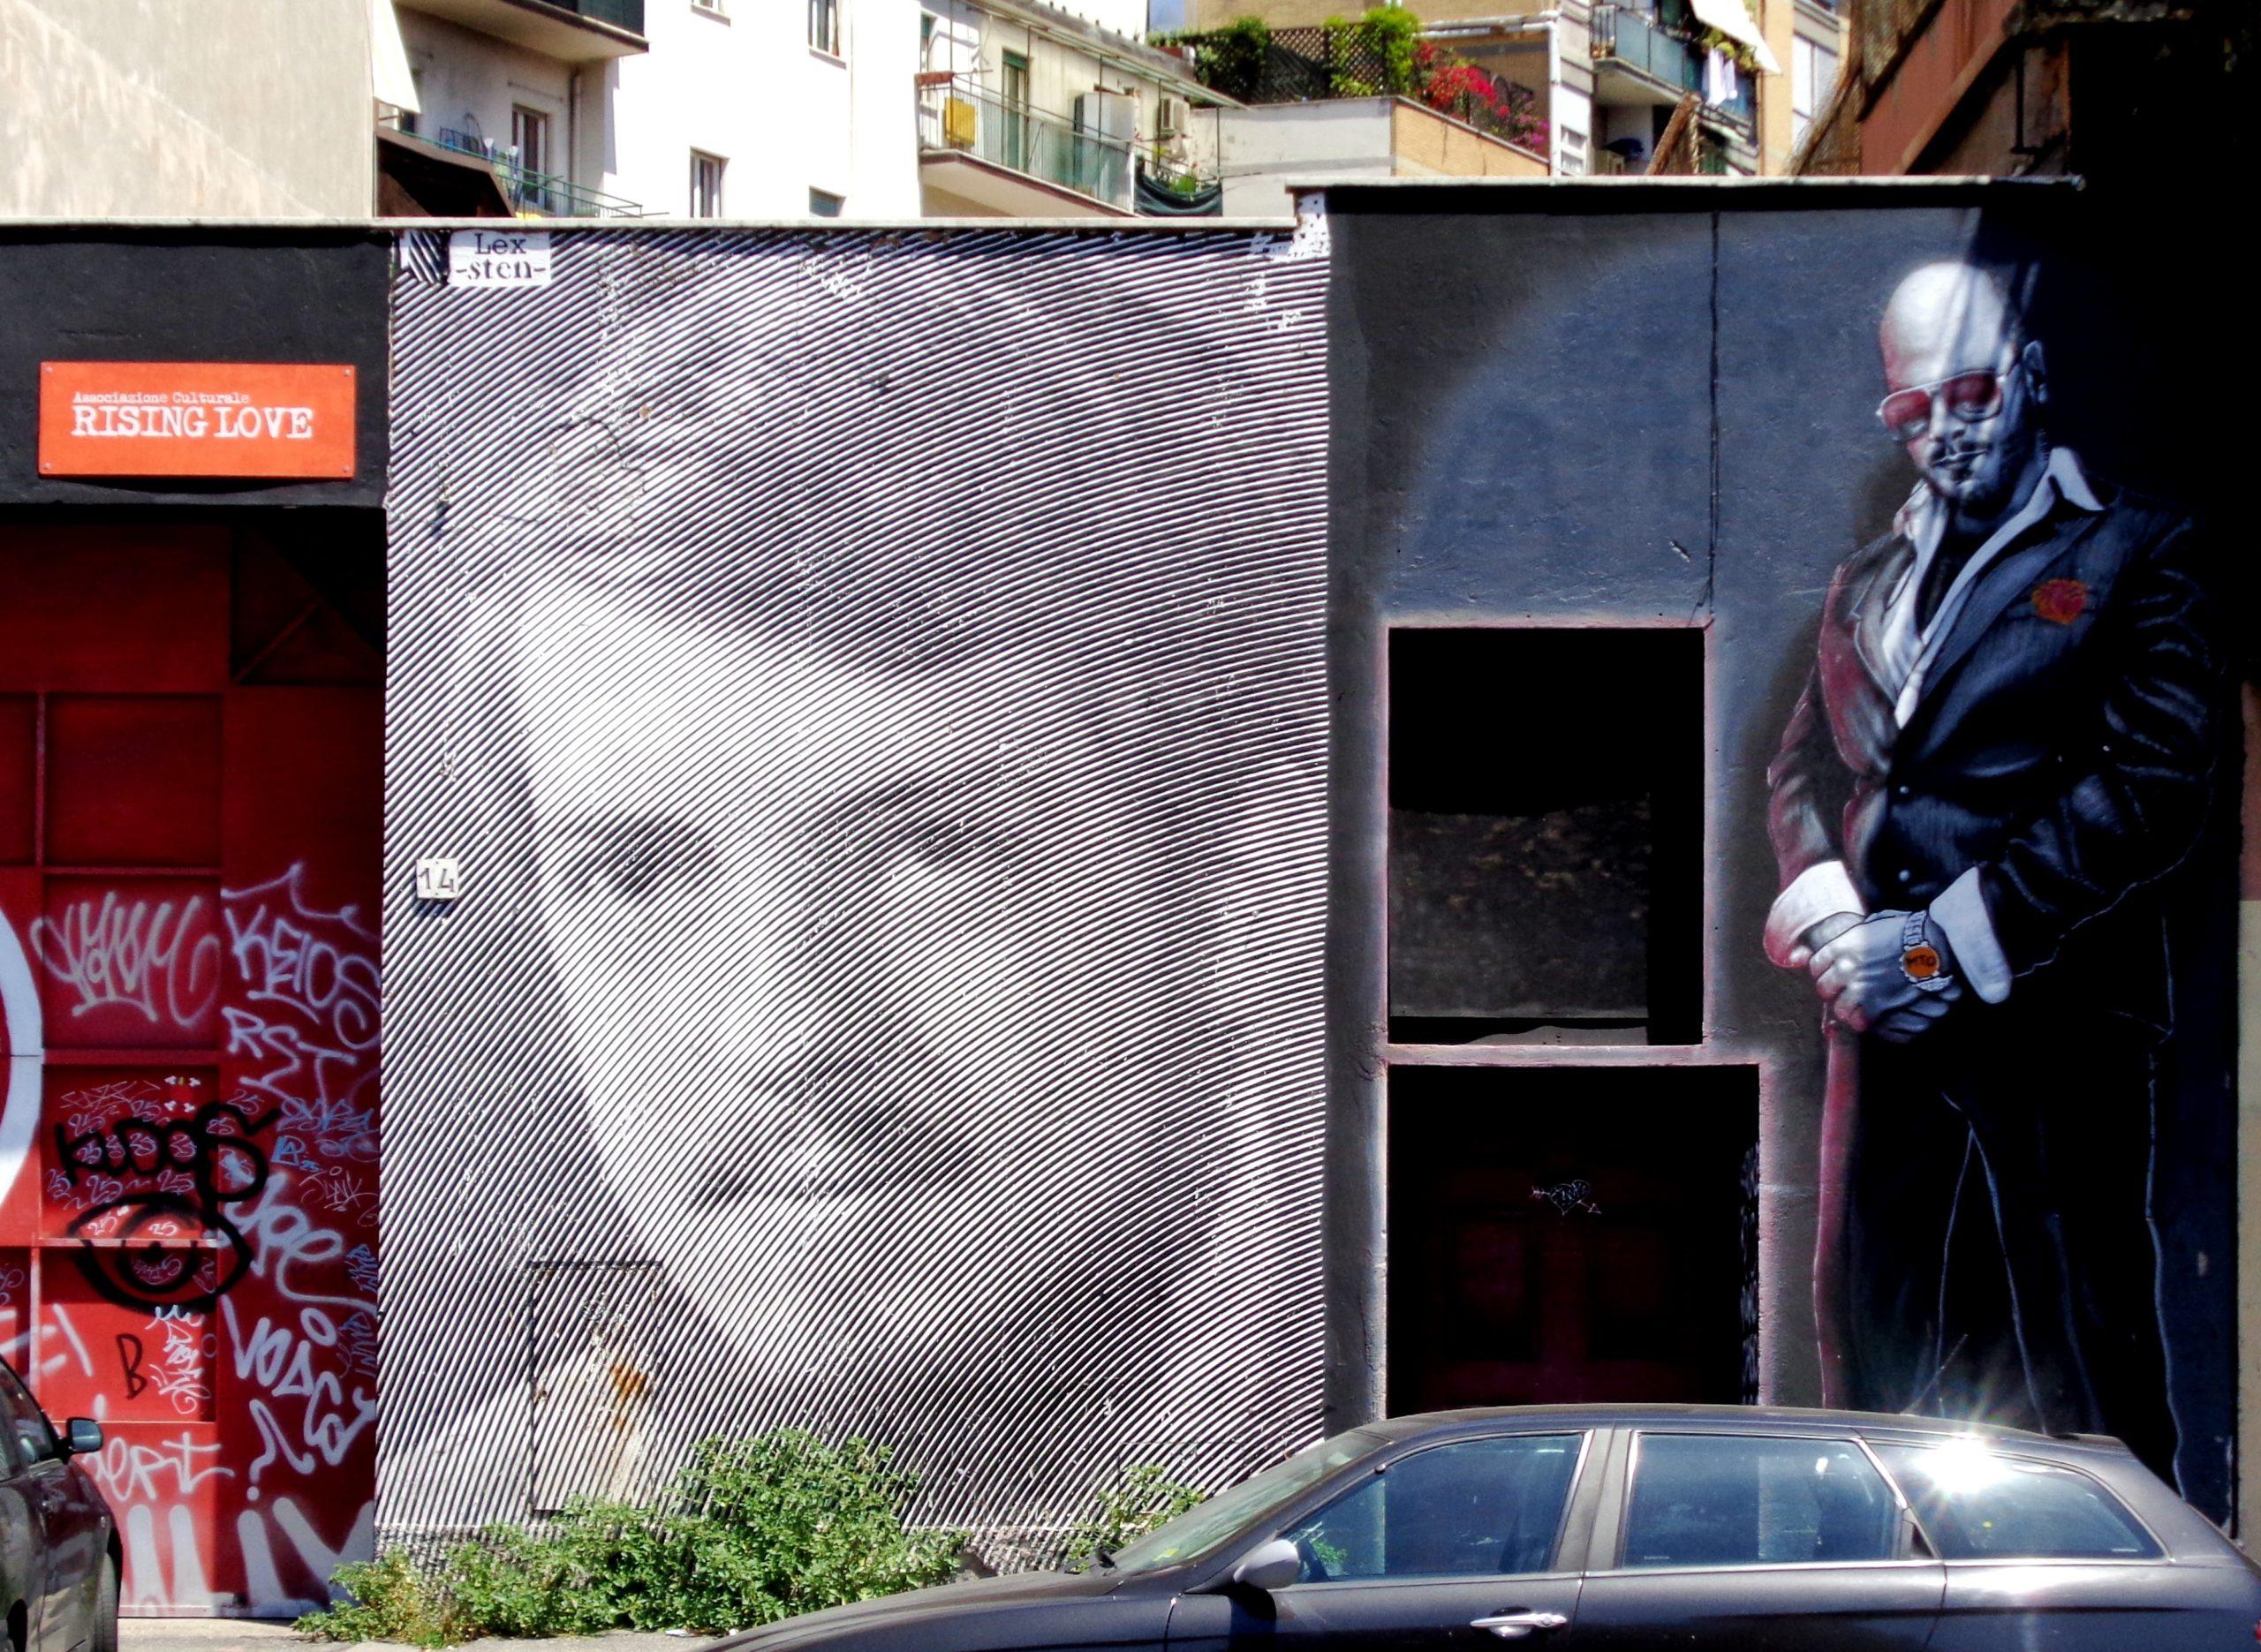 street art at rising love by sten&lex mto ostiense roma